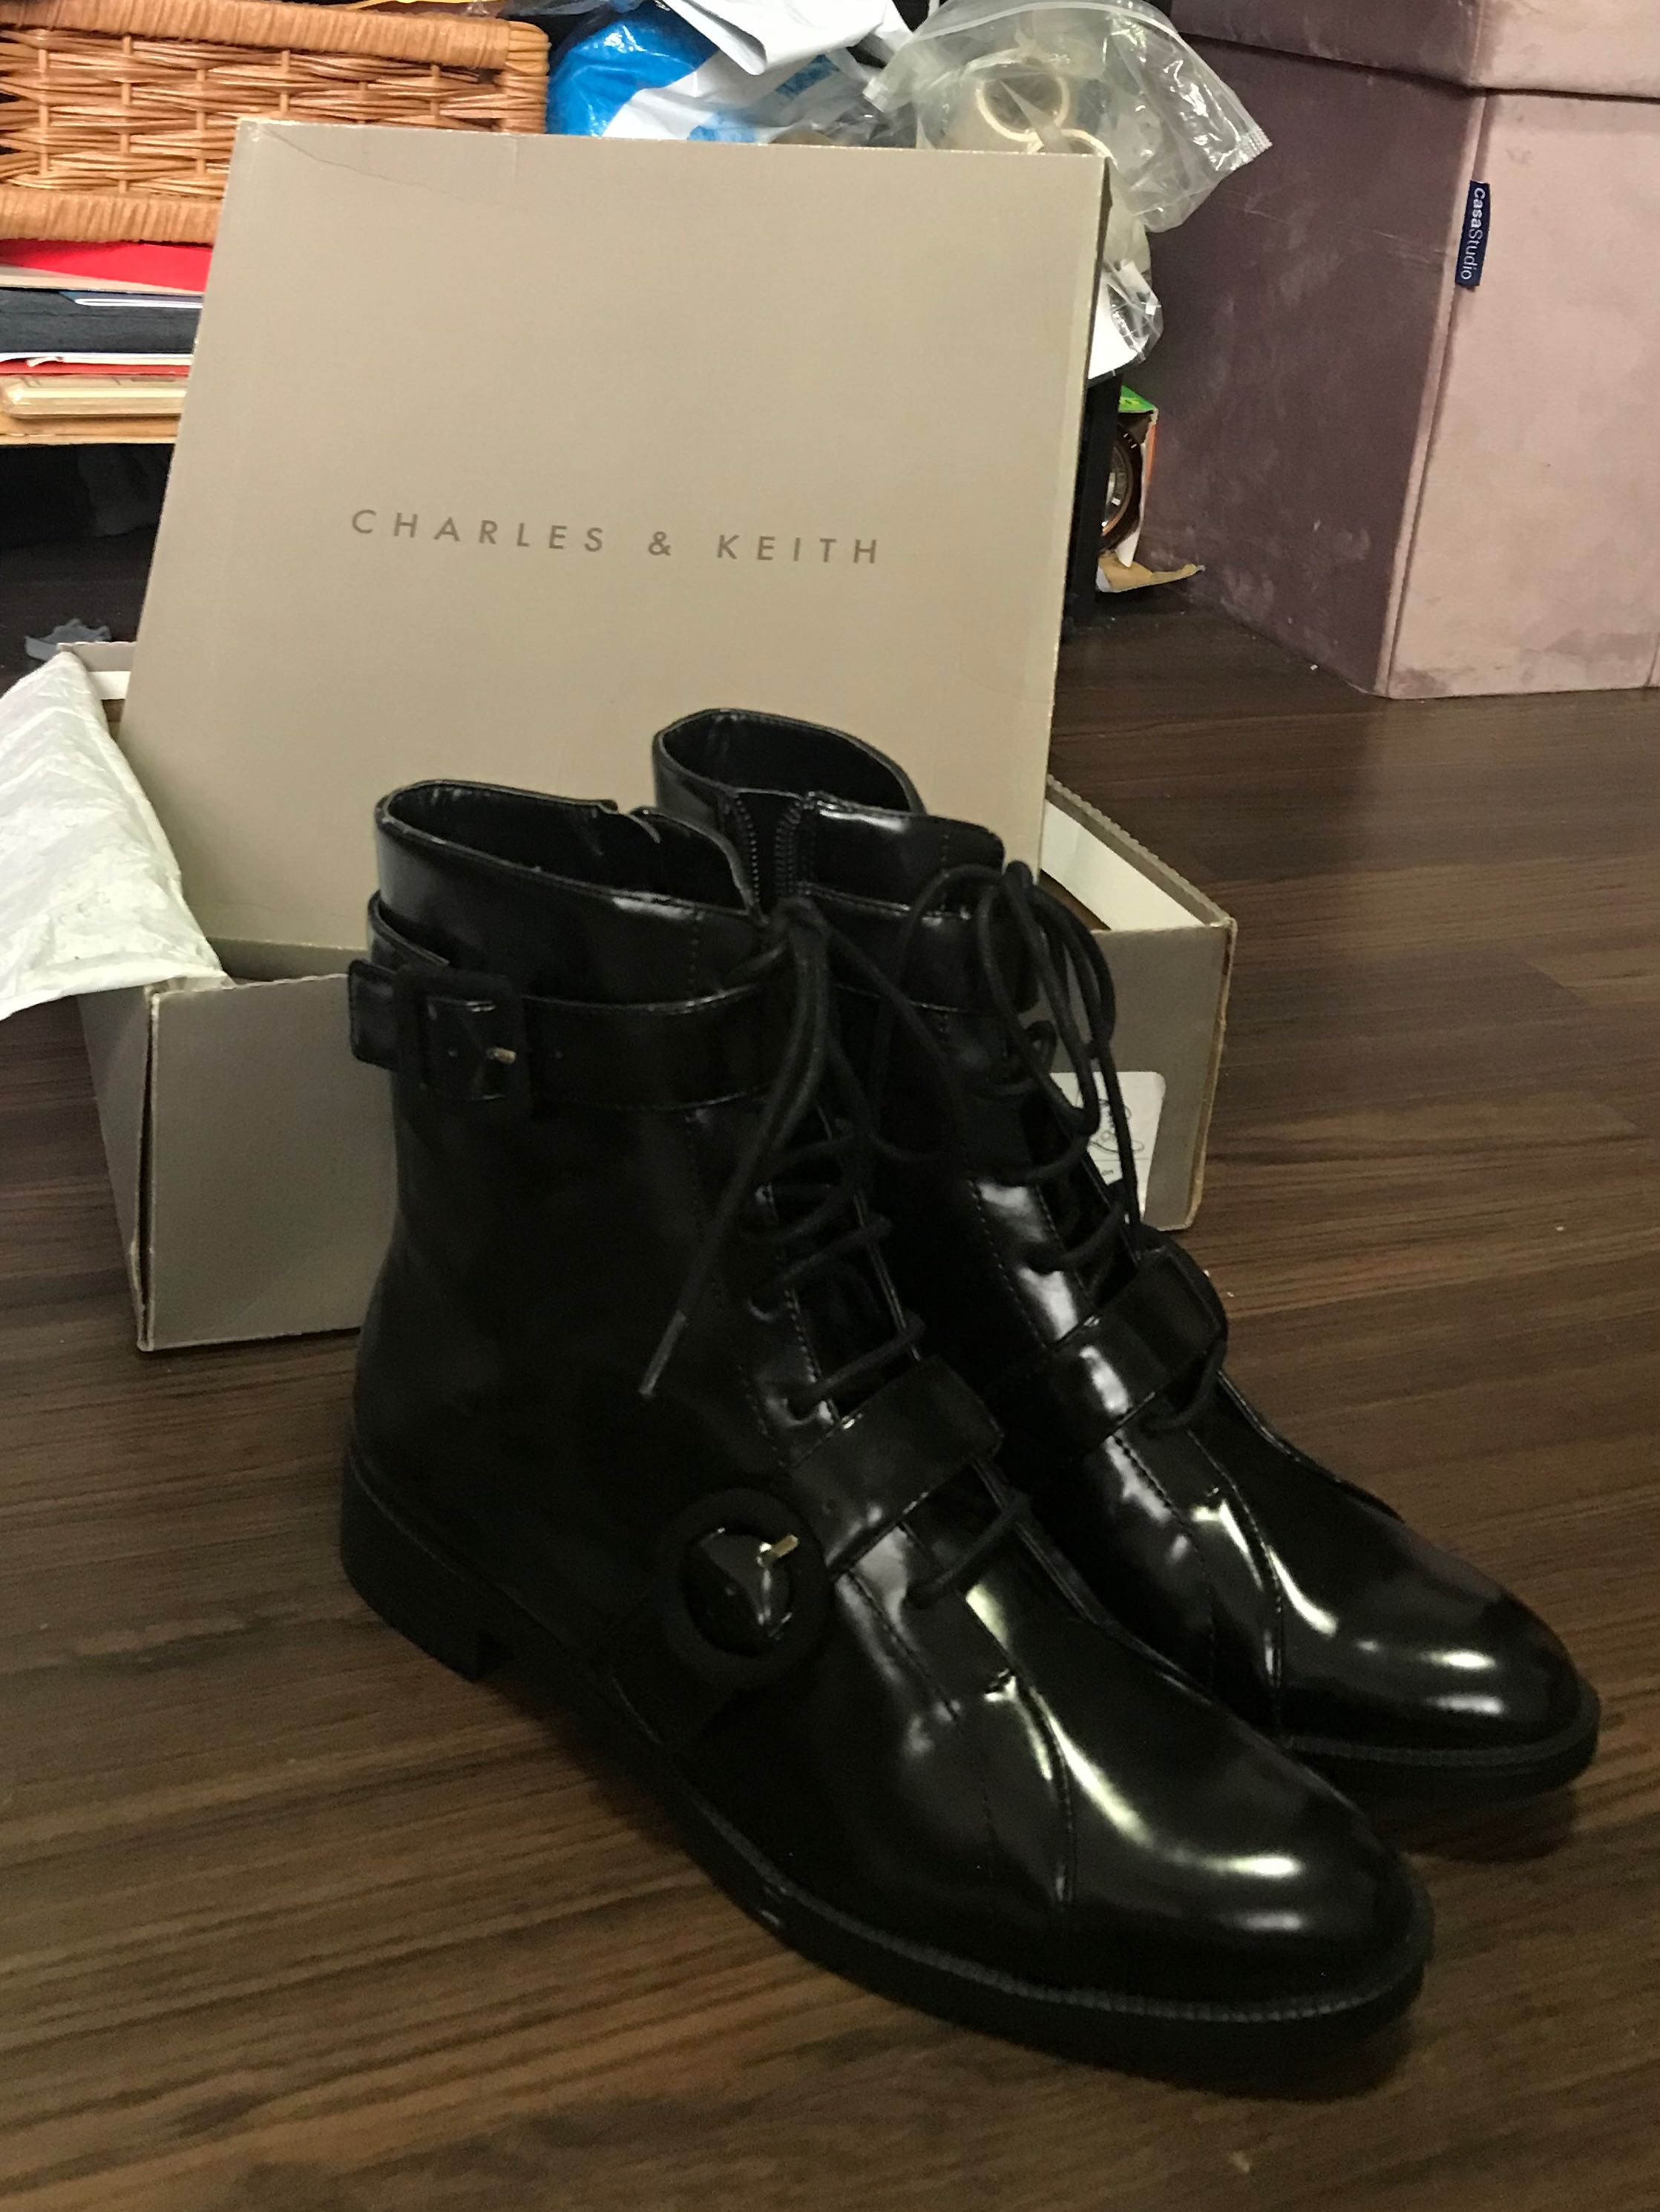 Charles \u0026 Keith Boots, Women's Fashion